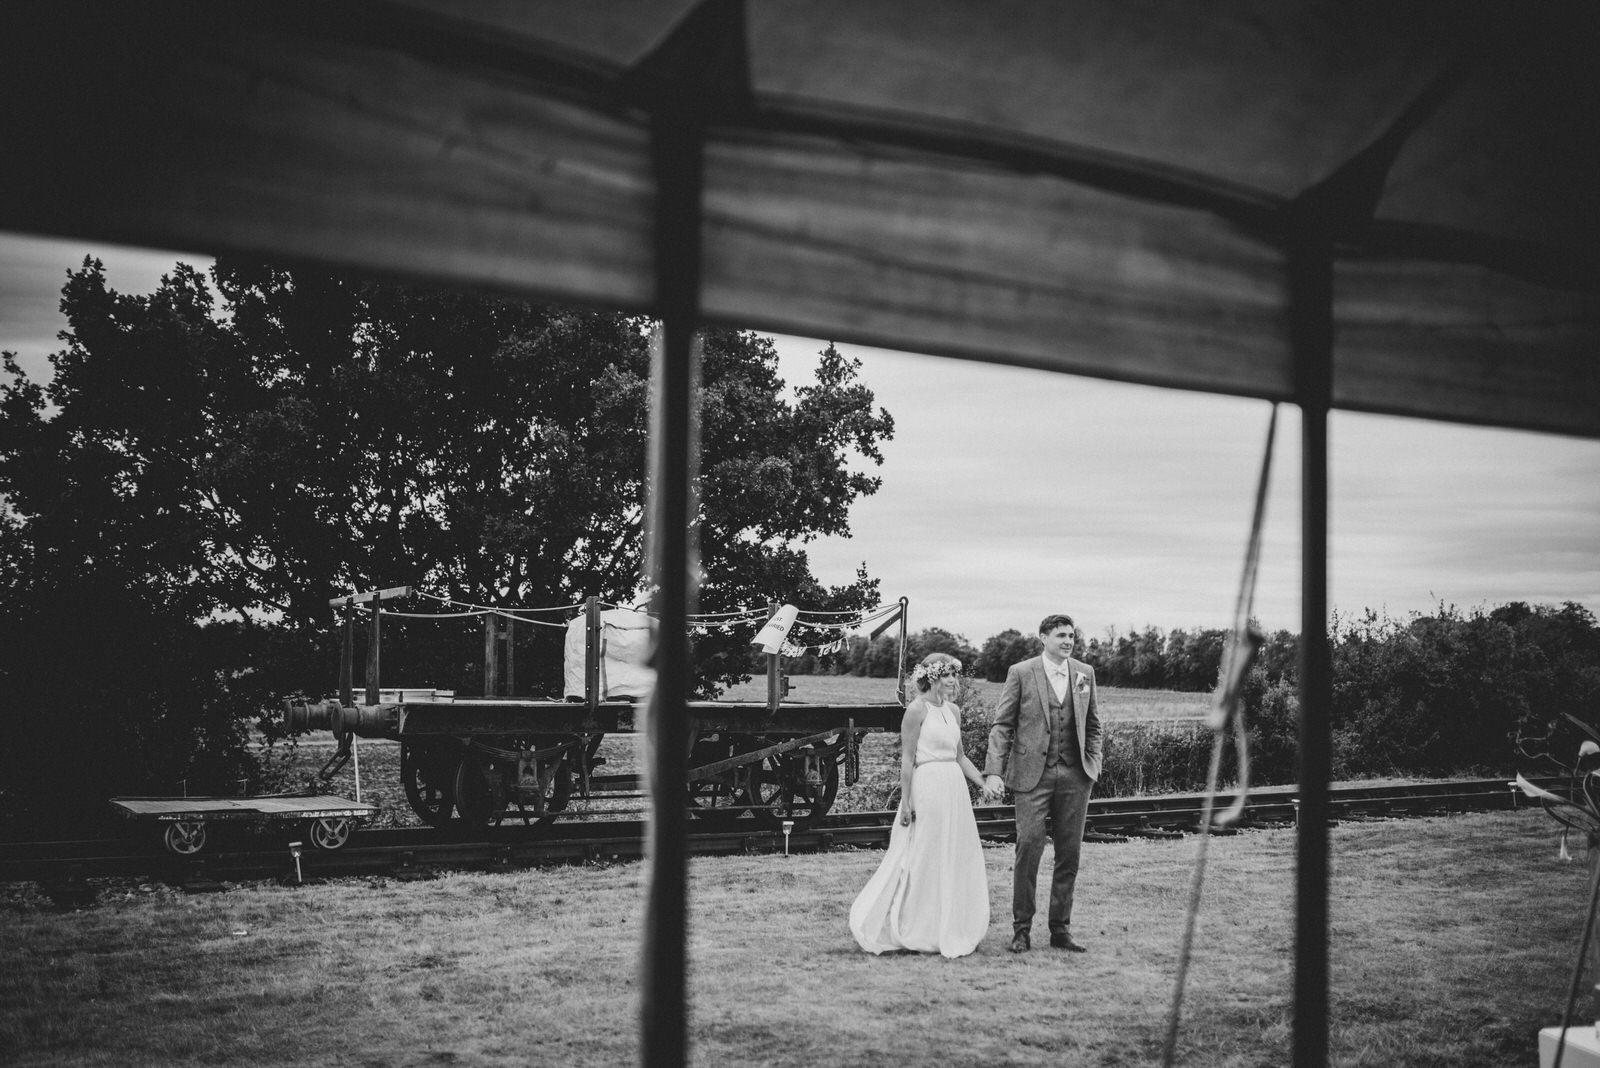 Rosanna & Richards wedding day at Rosanna father translation in Cambridgeshire